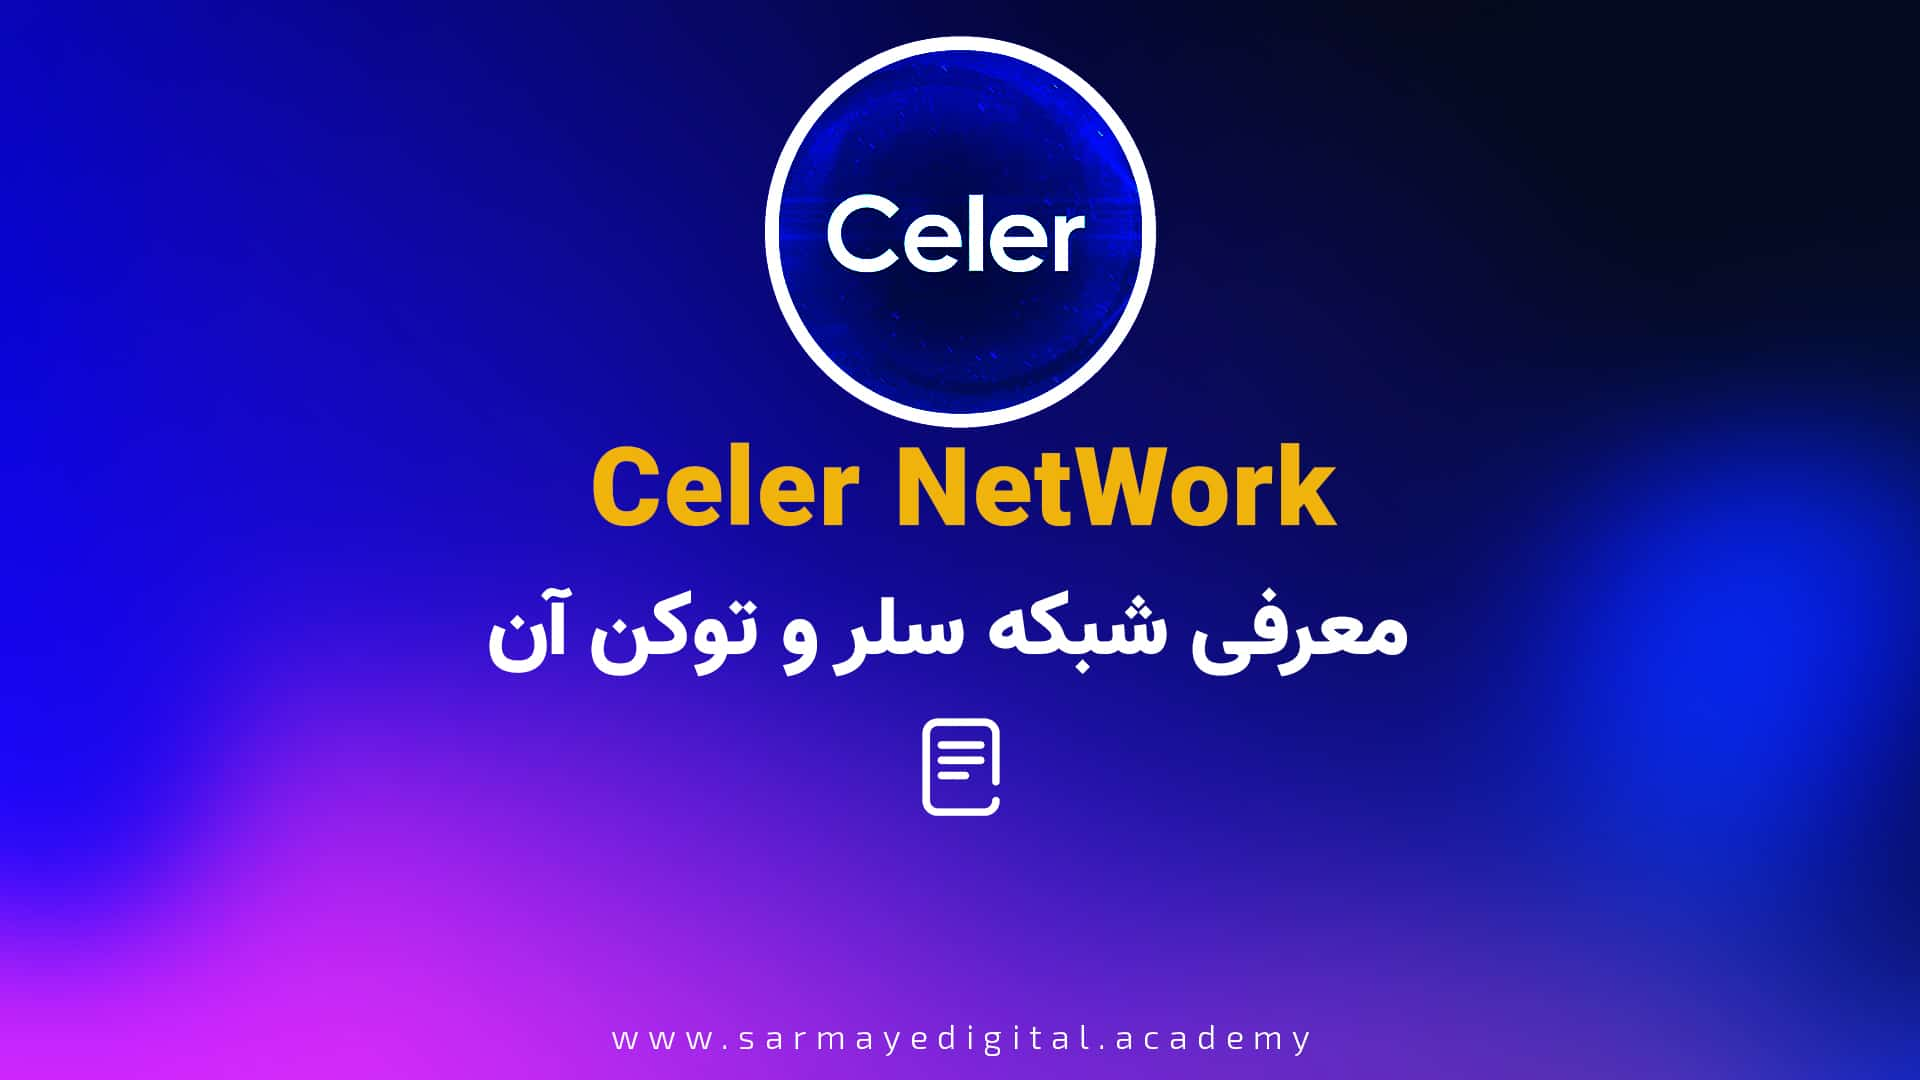 شبکه Celer